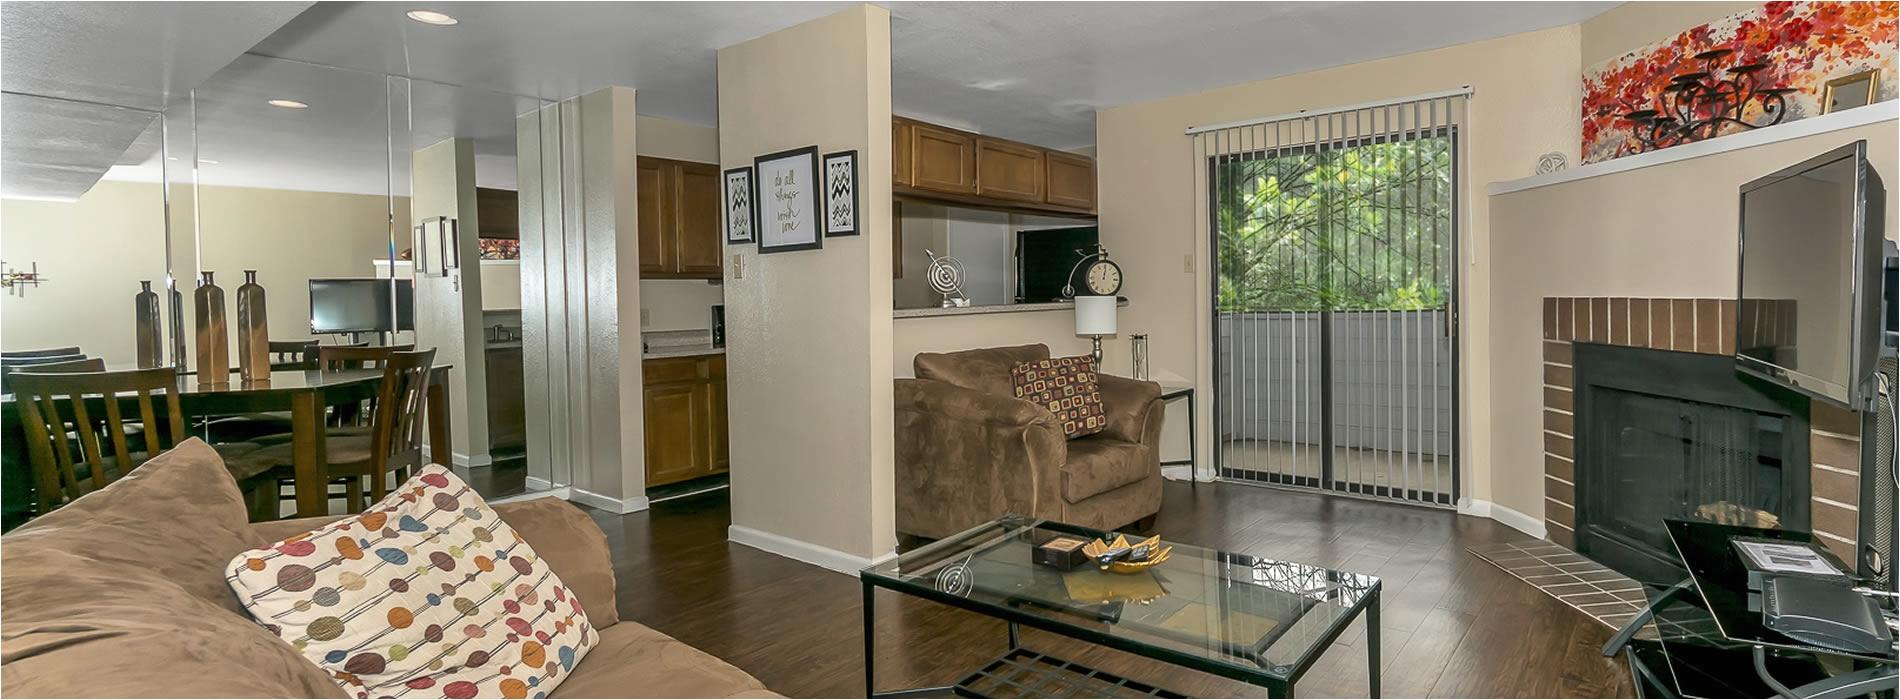 welcome to pecan ridge apartments in waco texas